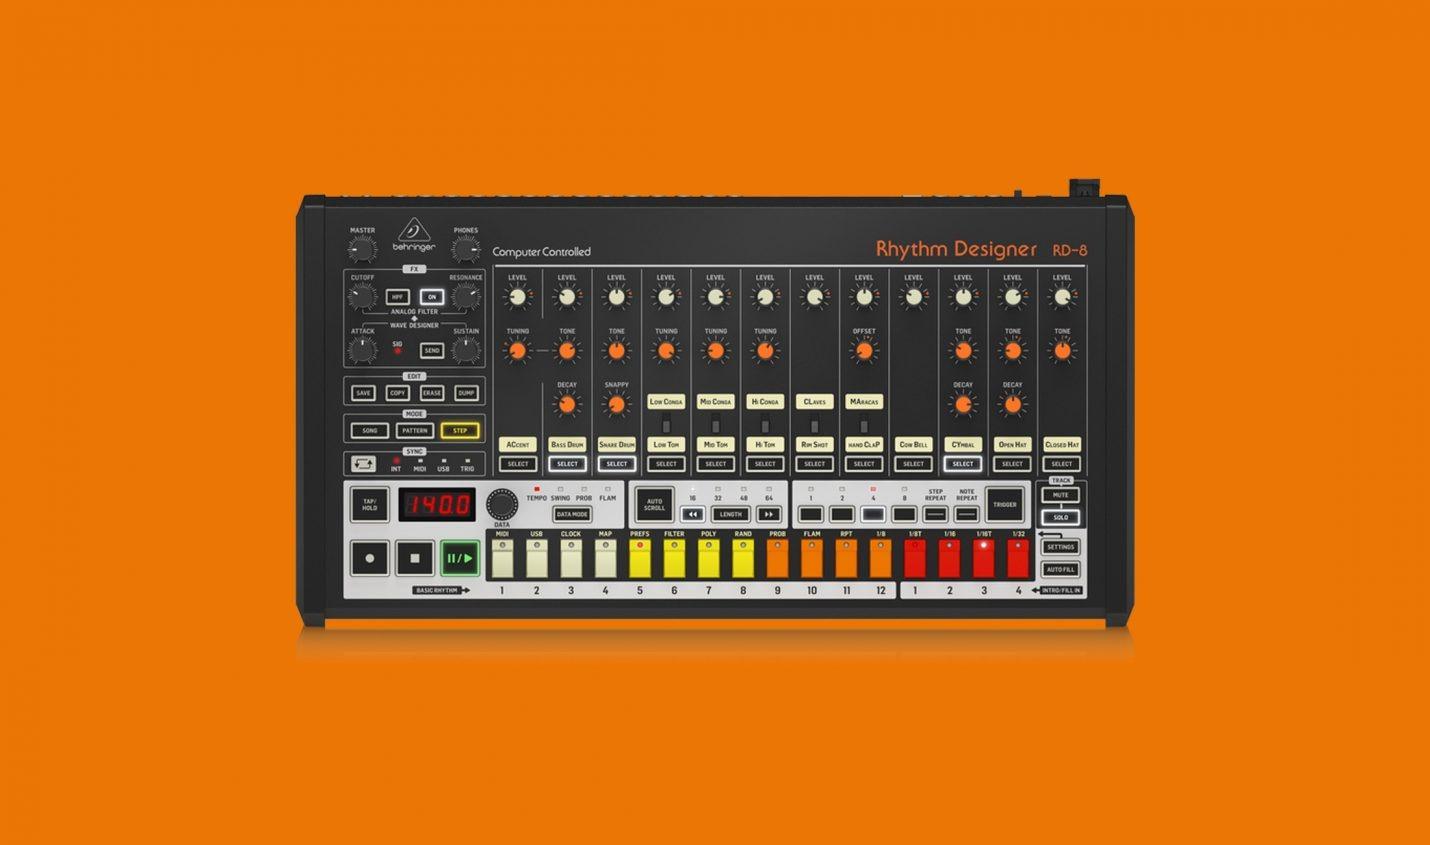 Behringer RD-8 (TR-808-Klon) ab sofort vorbestellbar - DJ LAB